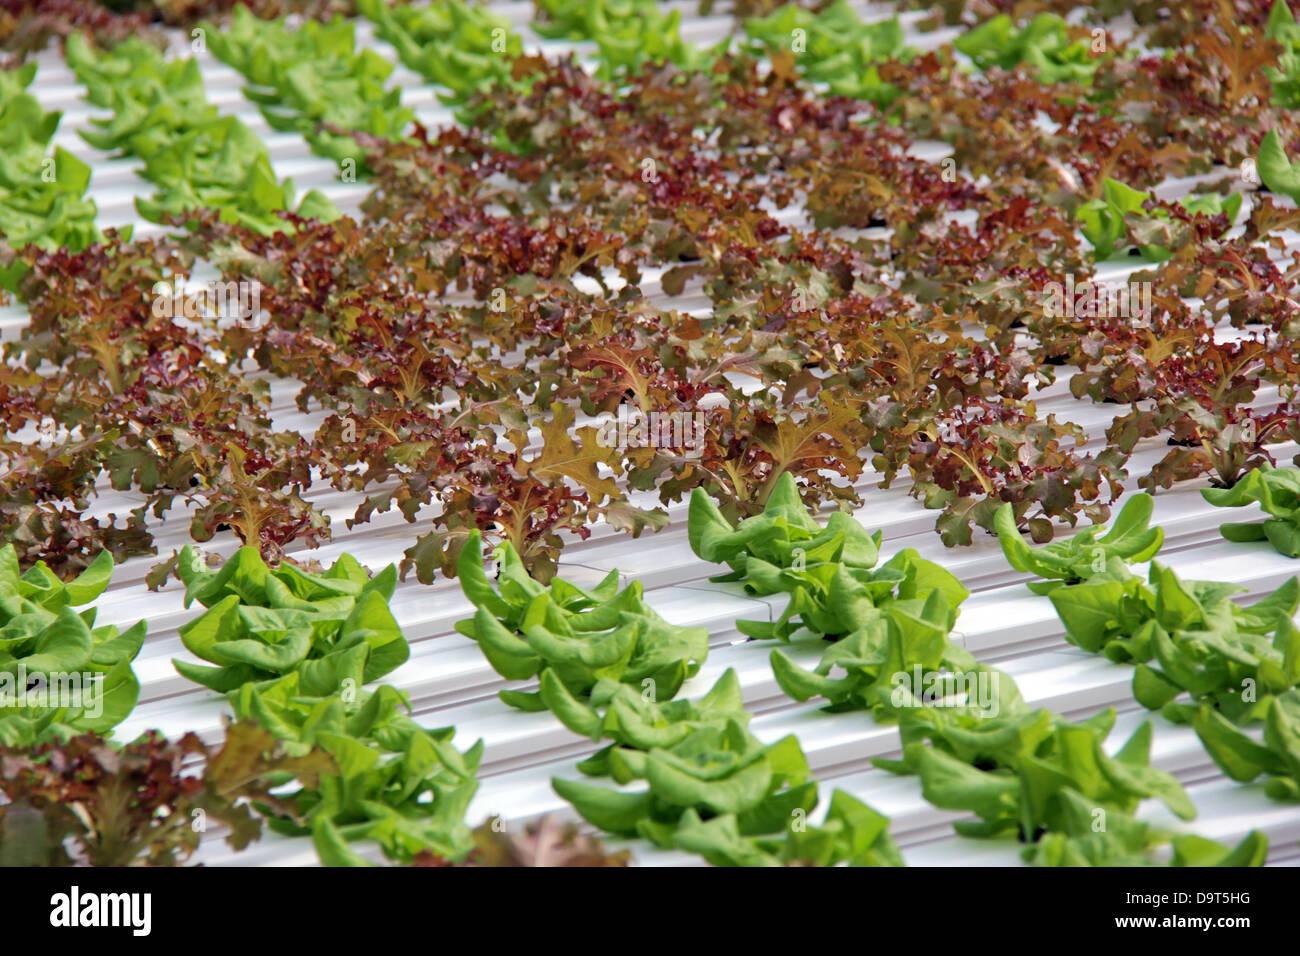 Organic hydroponic lettuce cultivation Stock Photo: 57694268 - Alamy